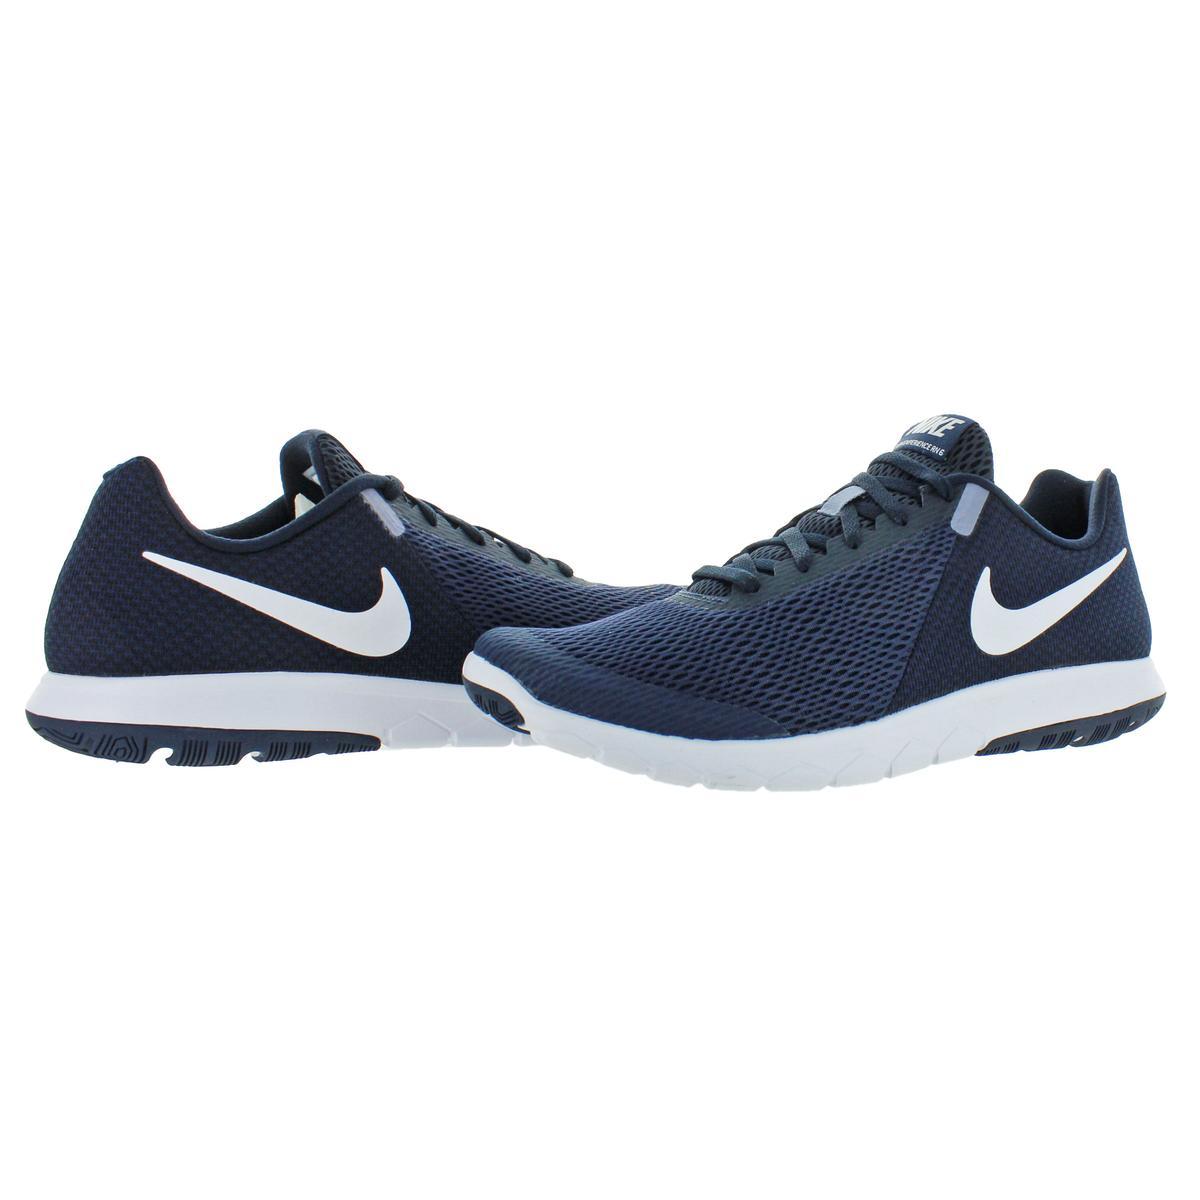 f9b2e48ba675 Nike Mens Flex Experience RN 6 Athletic Trainer Running Shoes ...